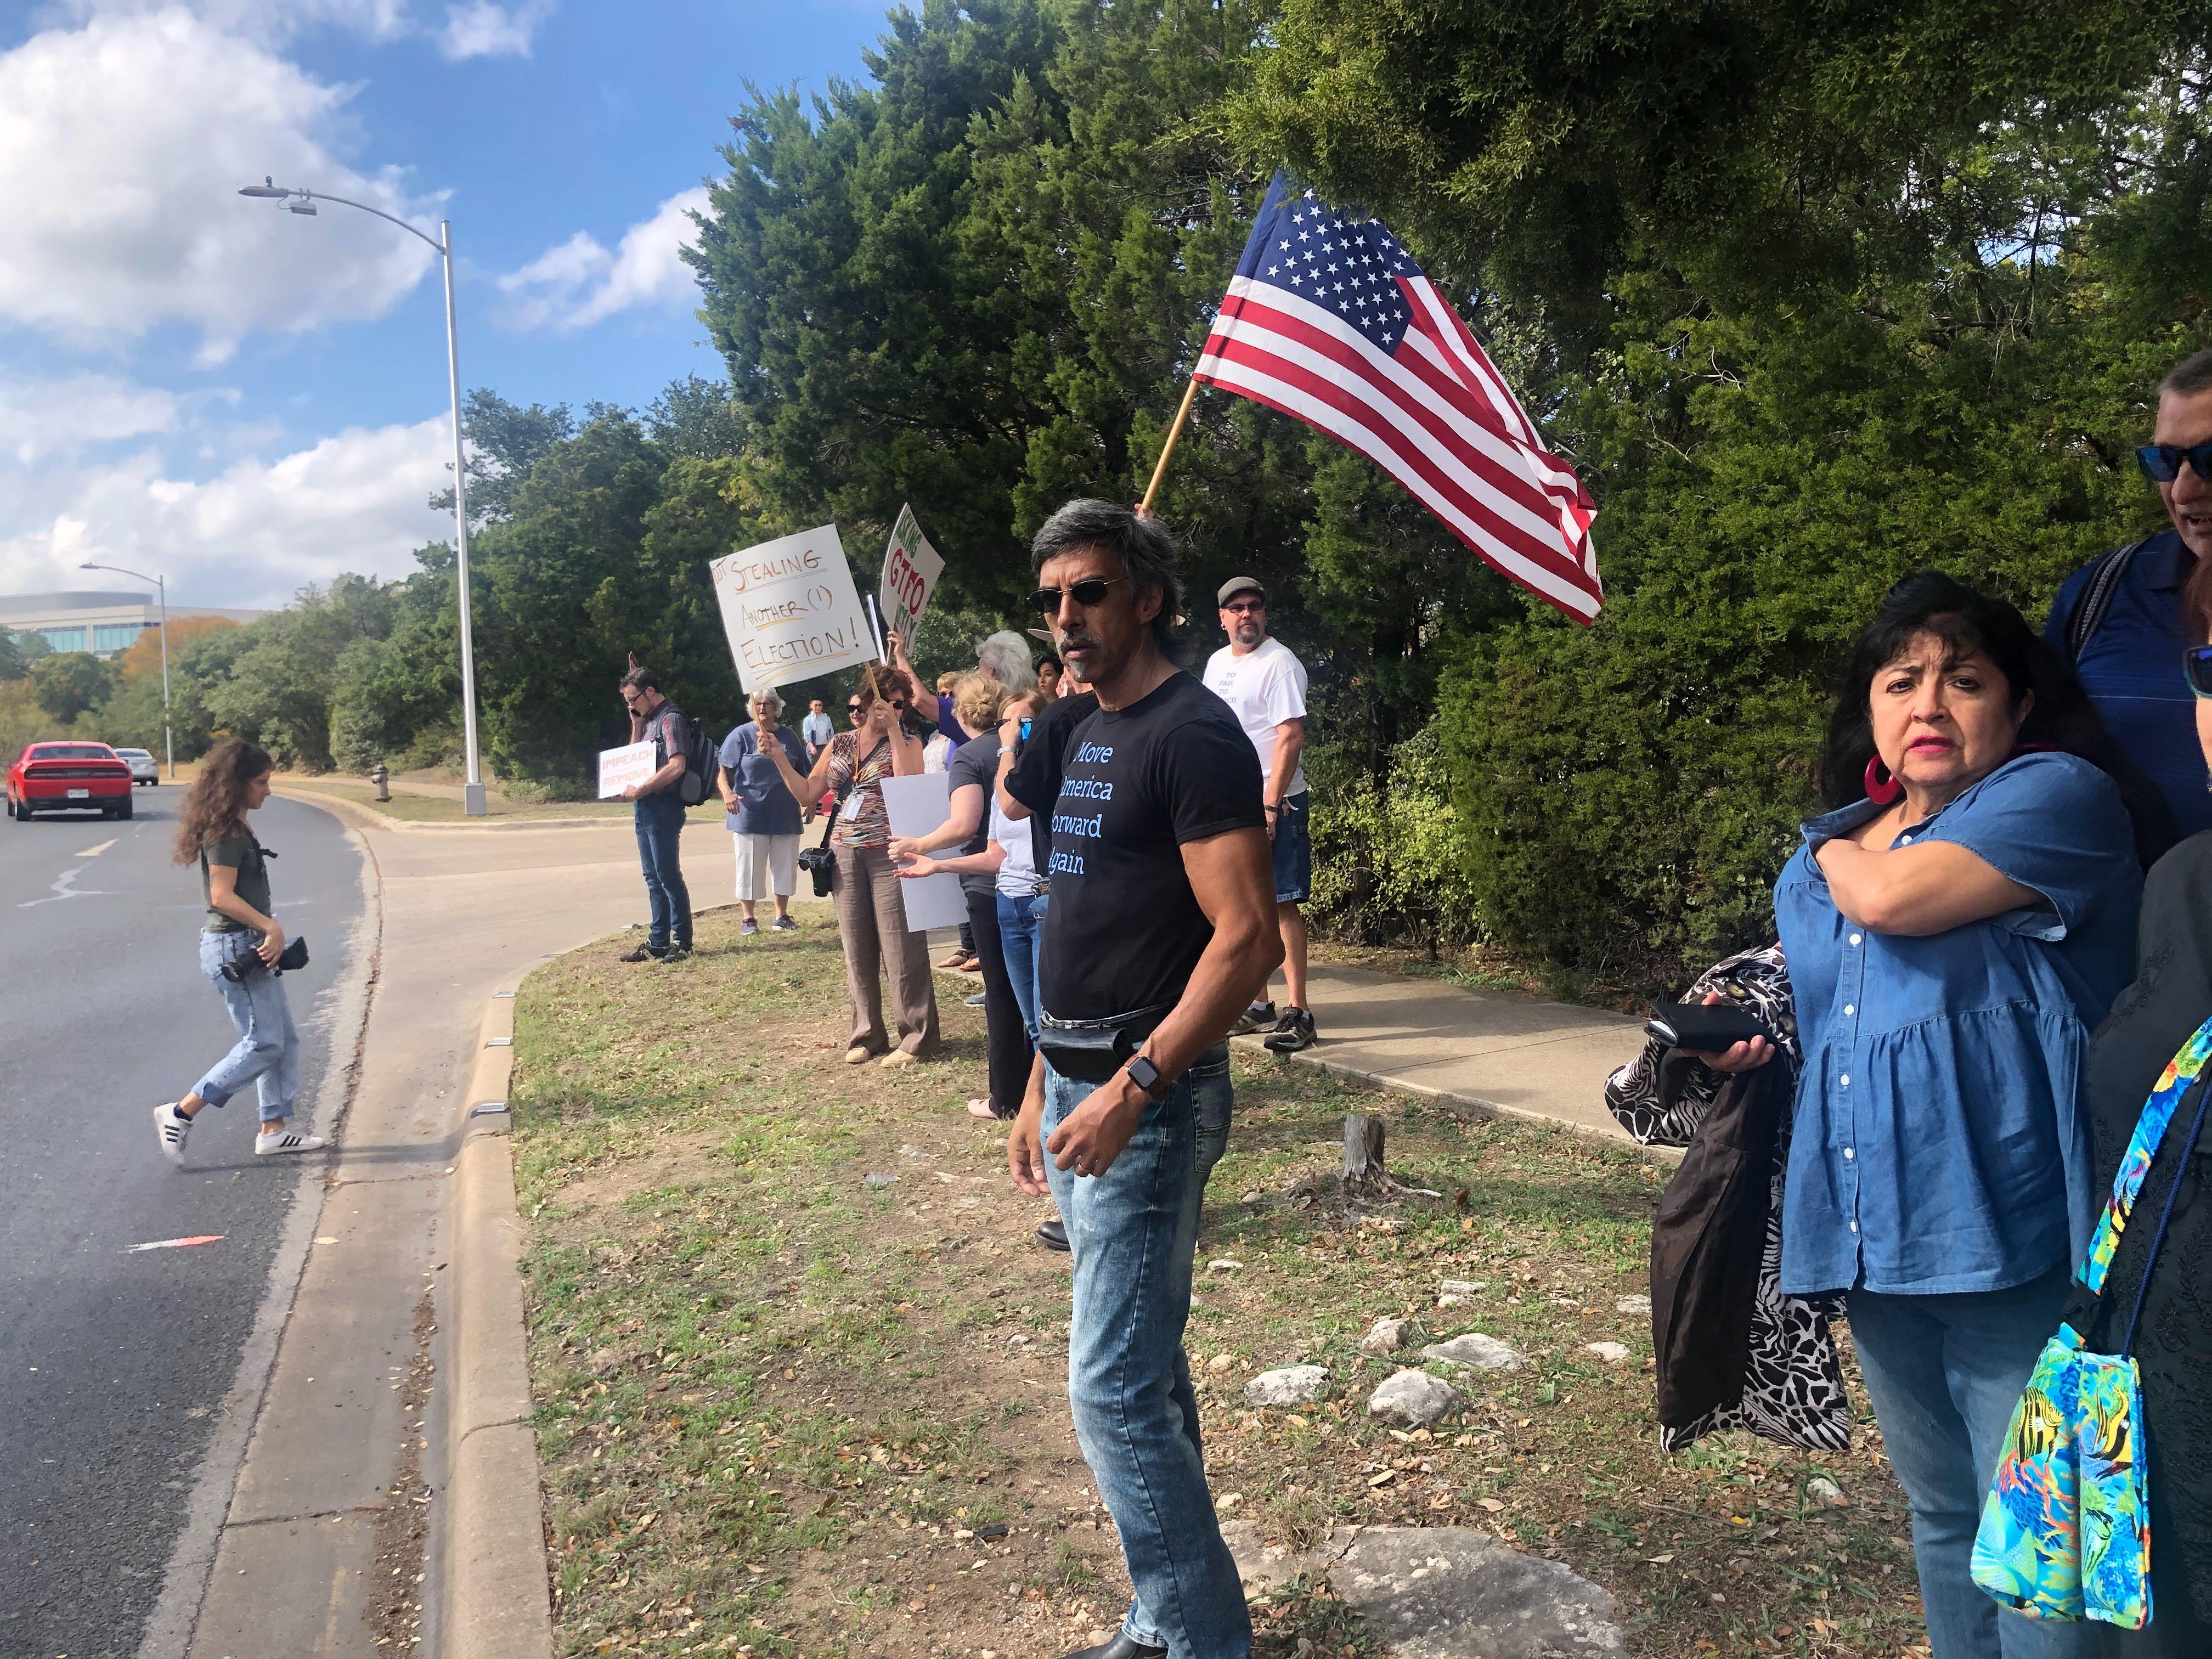 Indivisible Austin trump protest